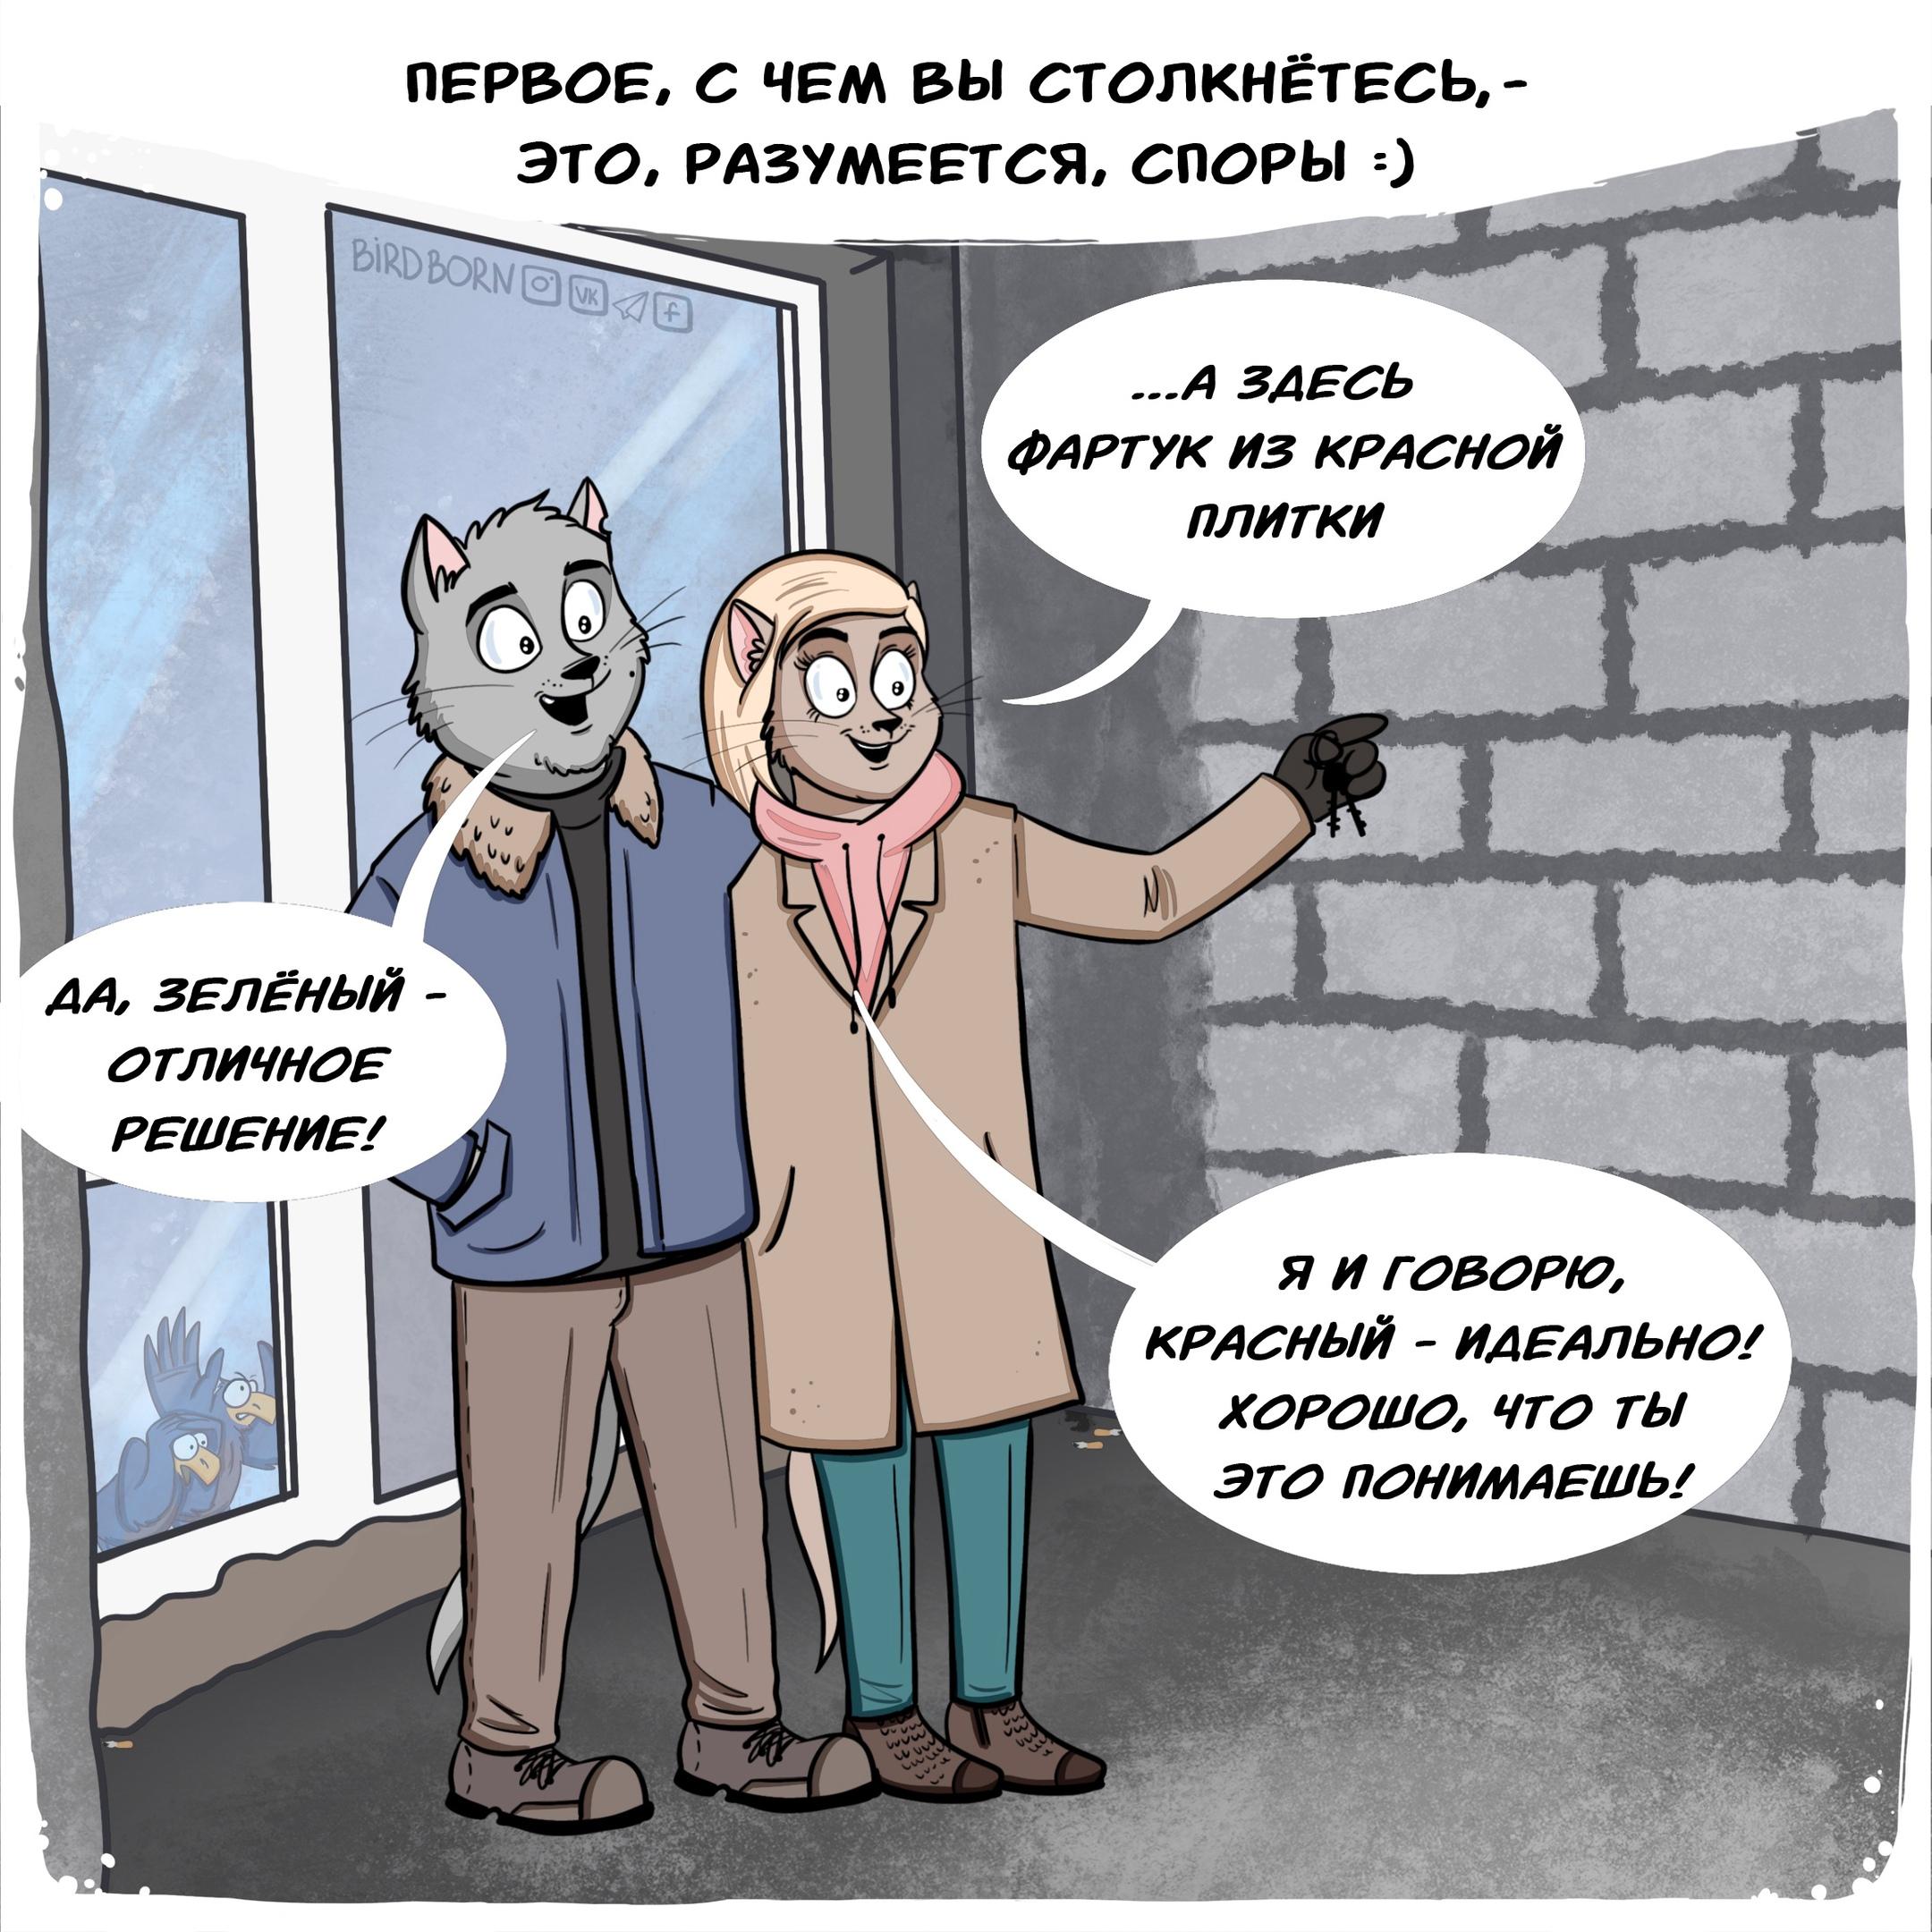 bird born ремонт комикс споры